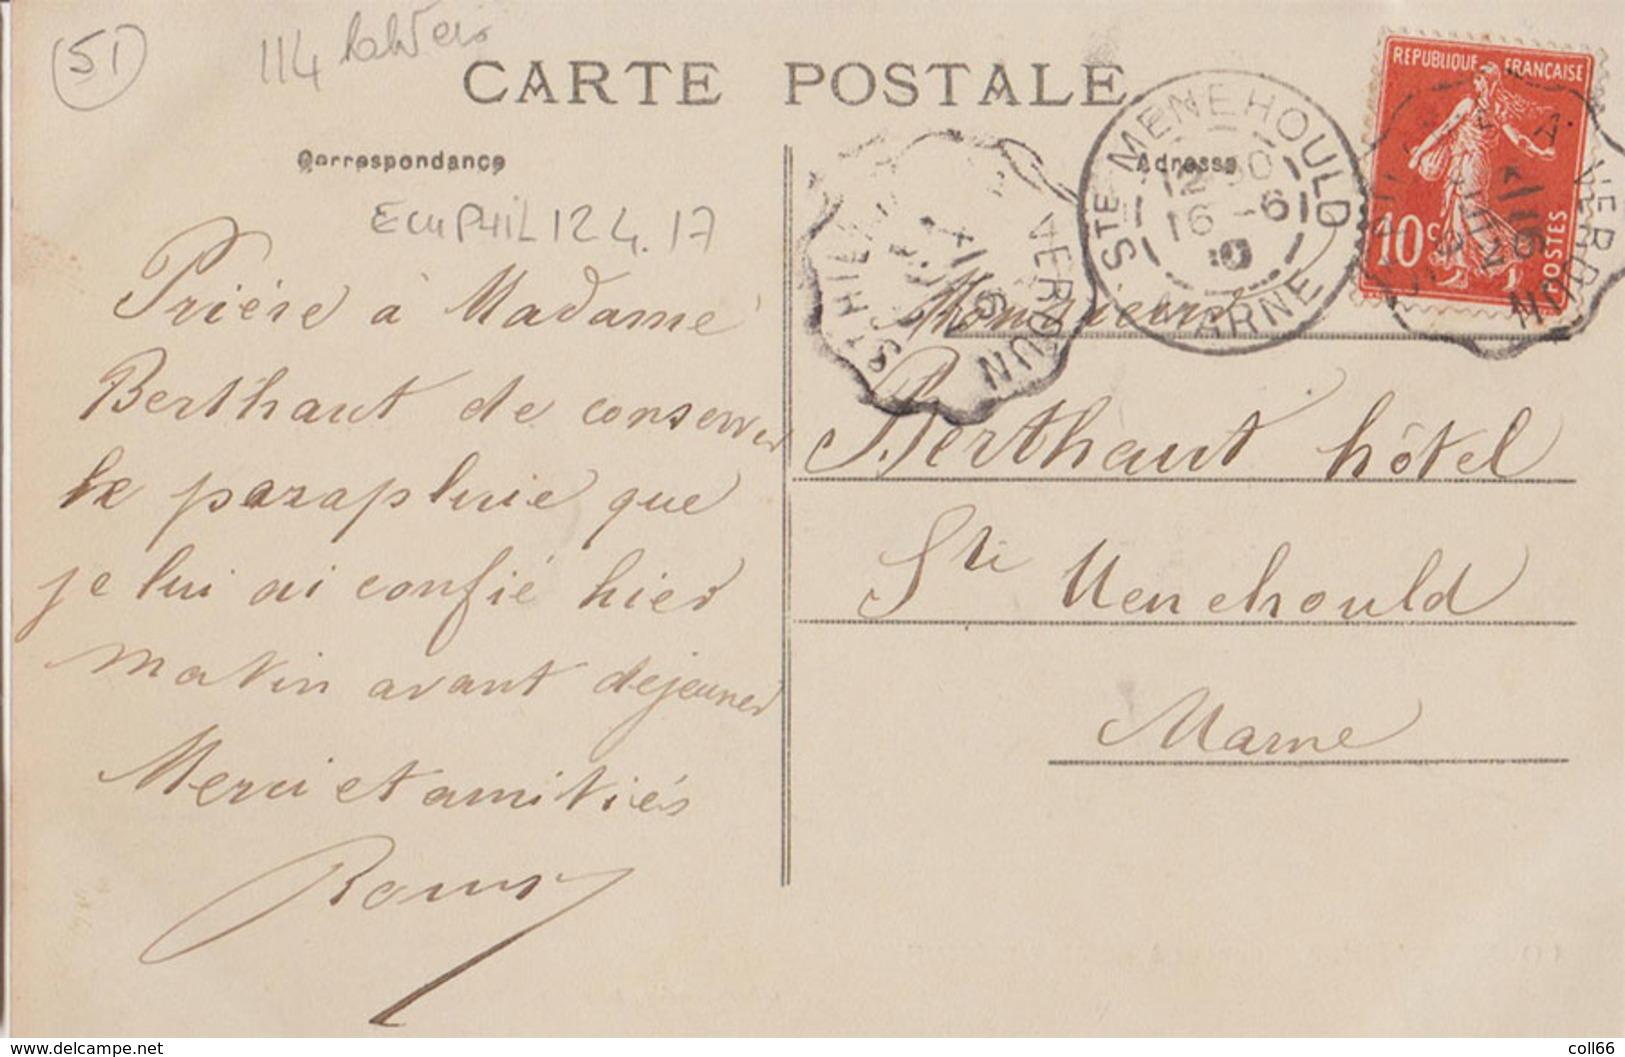 51 RARE Somme-Bionne Agriculteur Rouyer-Bazin Attelage Très Gros Plan Oberlaender Poto-éditeur Ste Menehould TOP - France